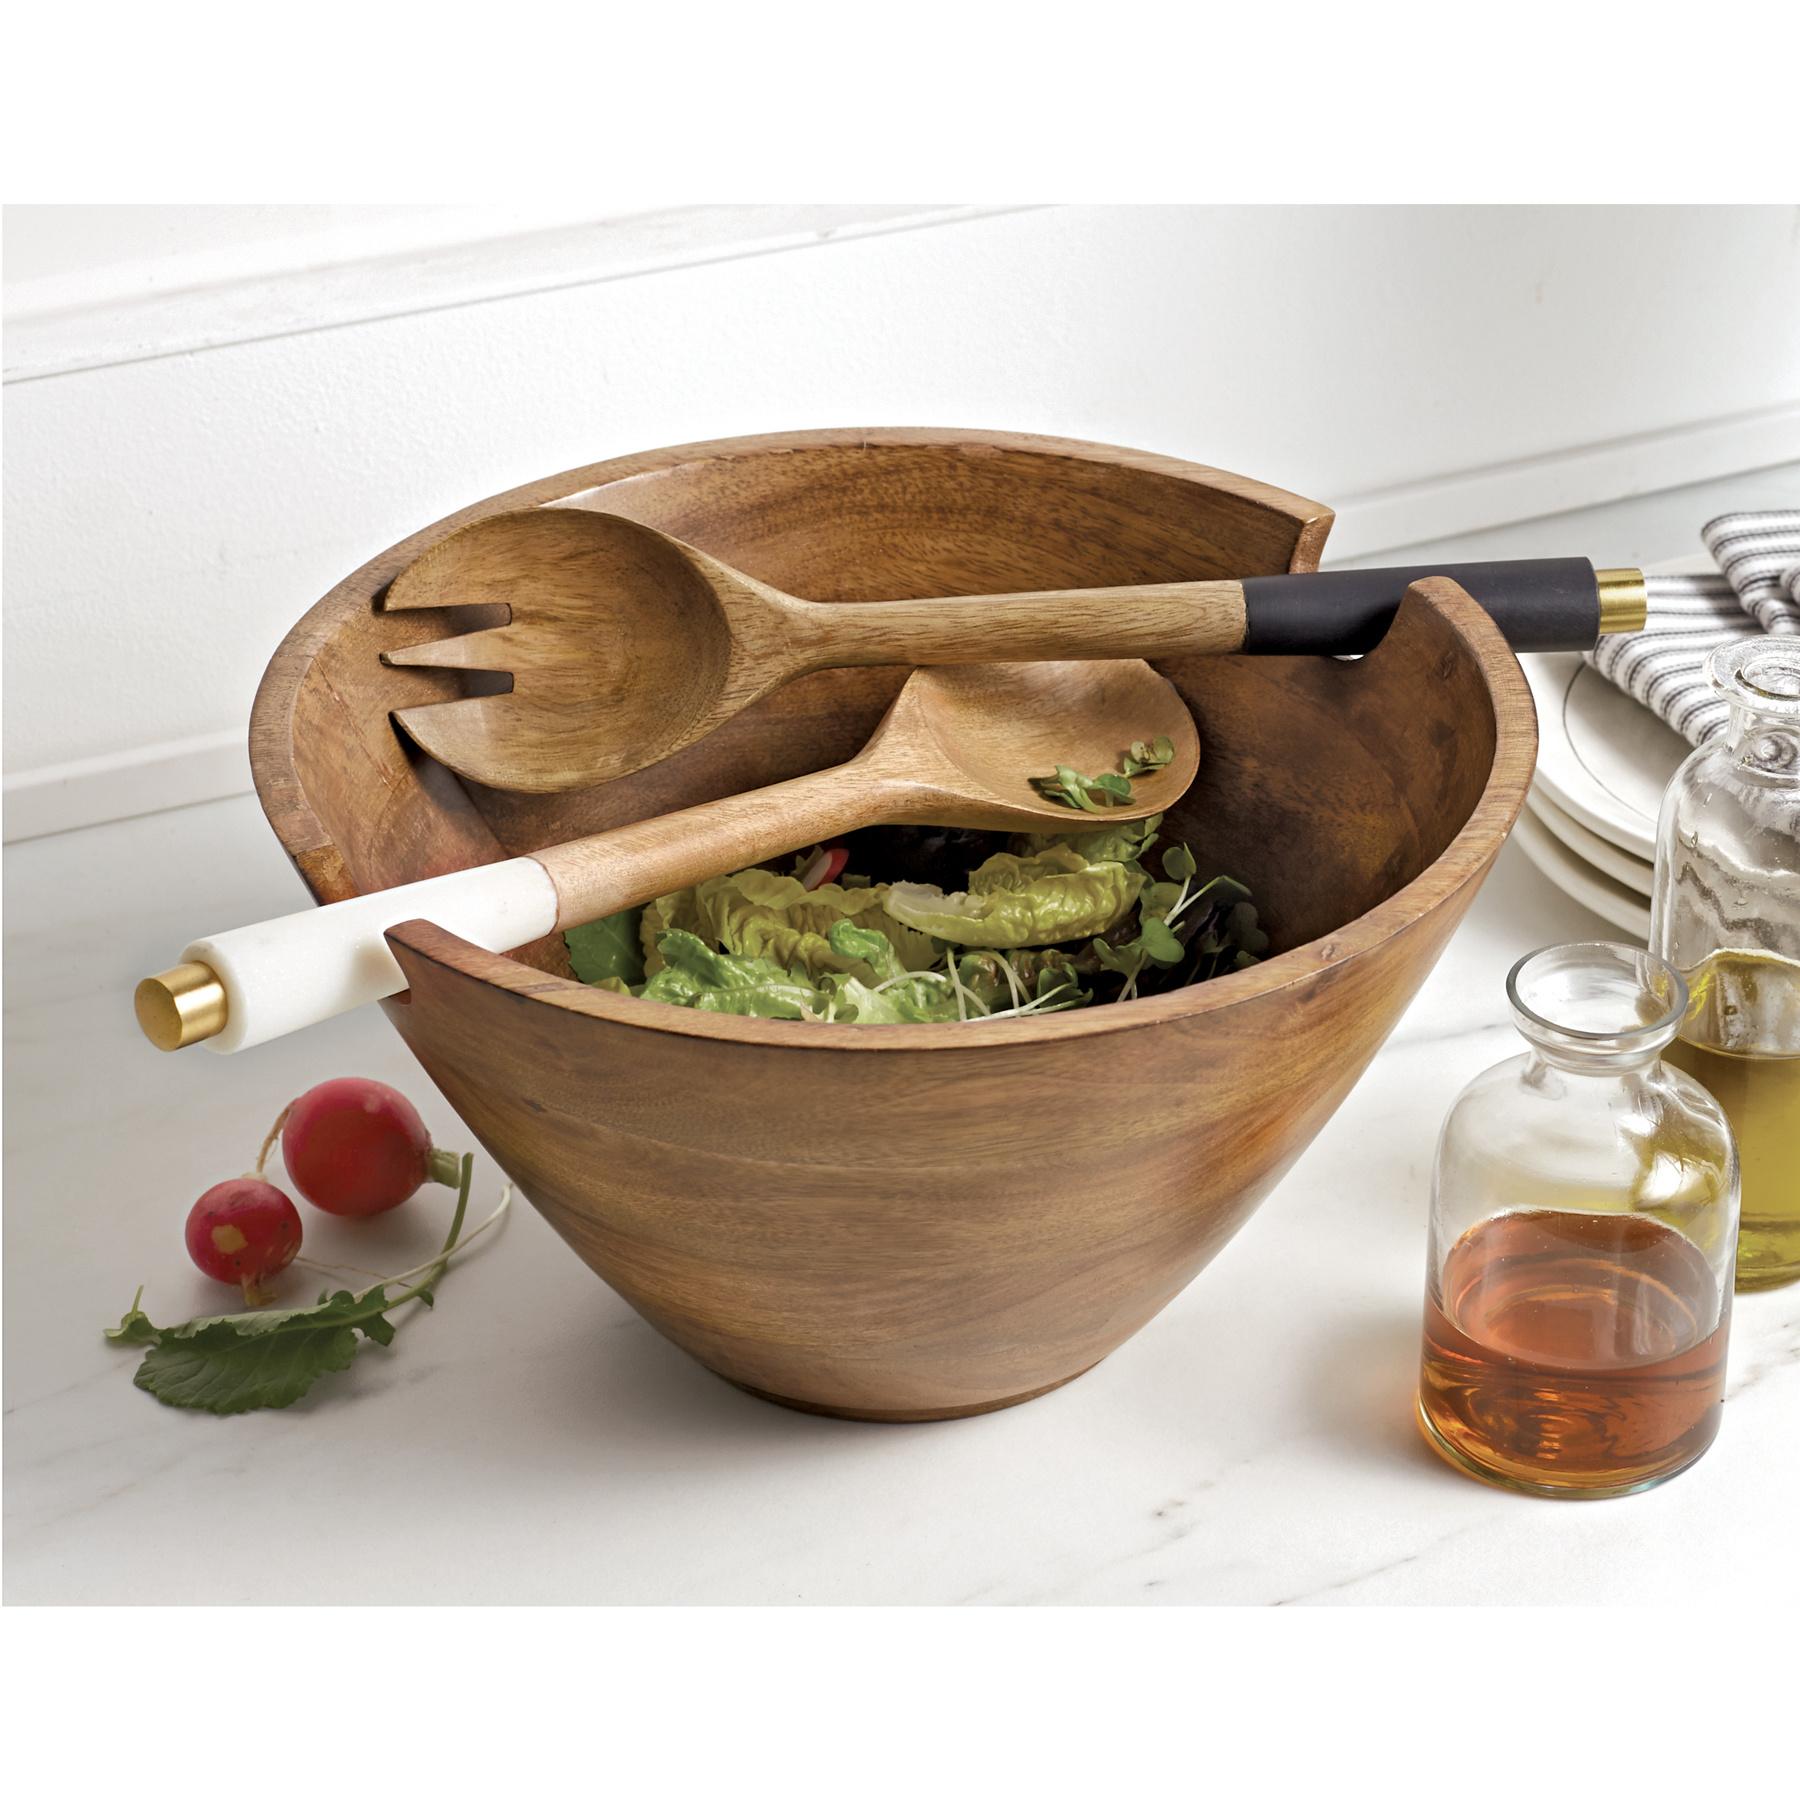 Mud Pie Wood bowl with server set